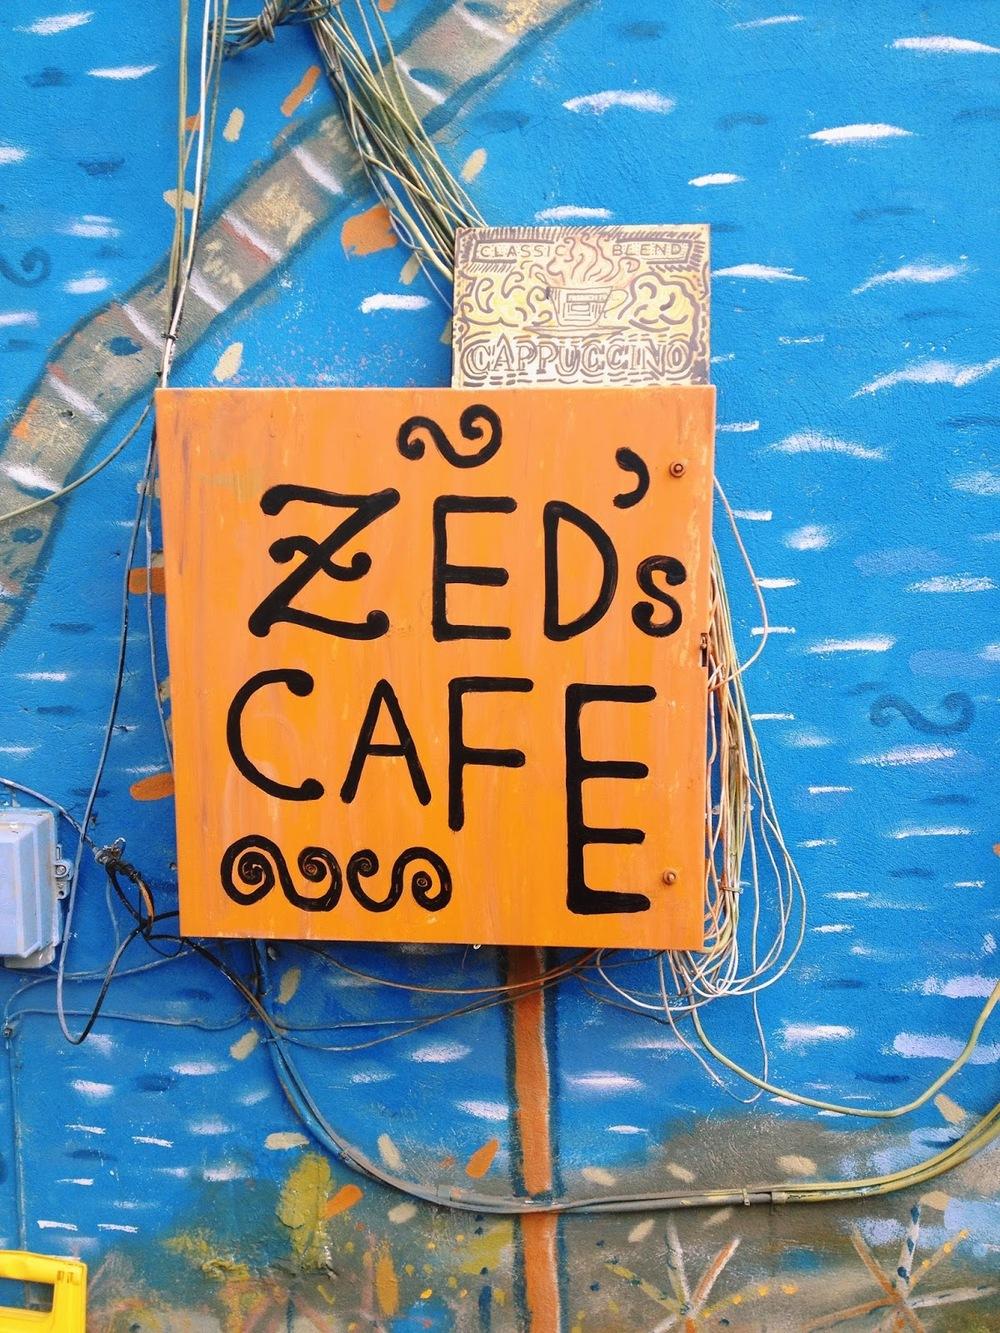 Zed's Cafe